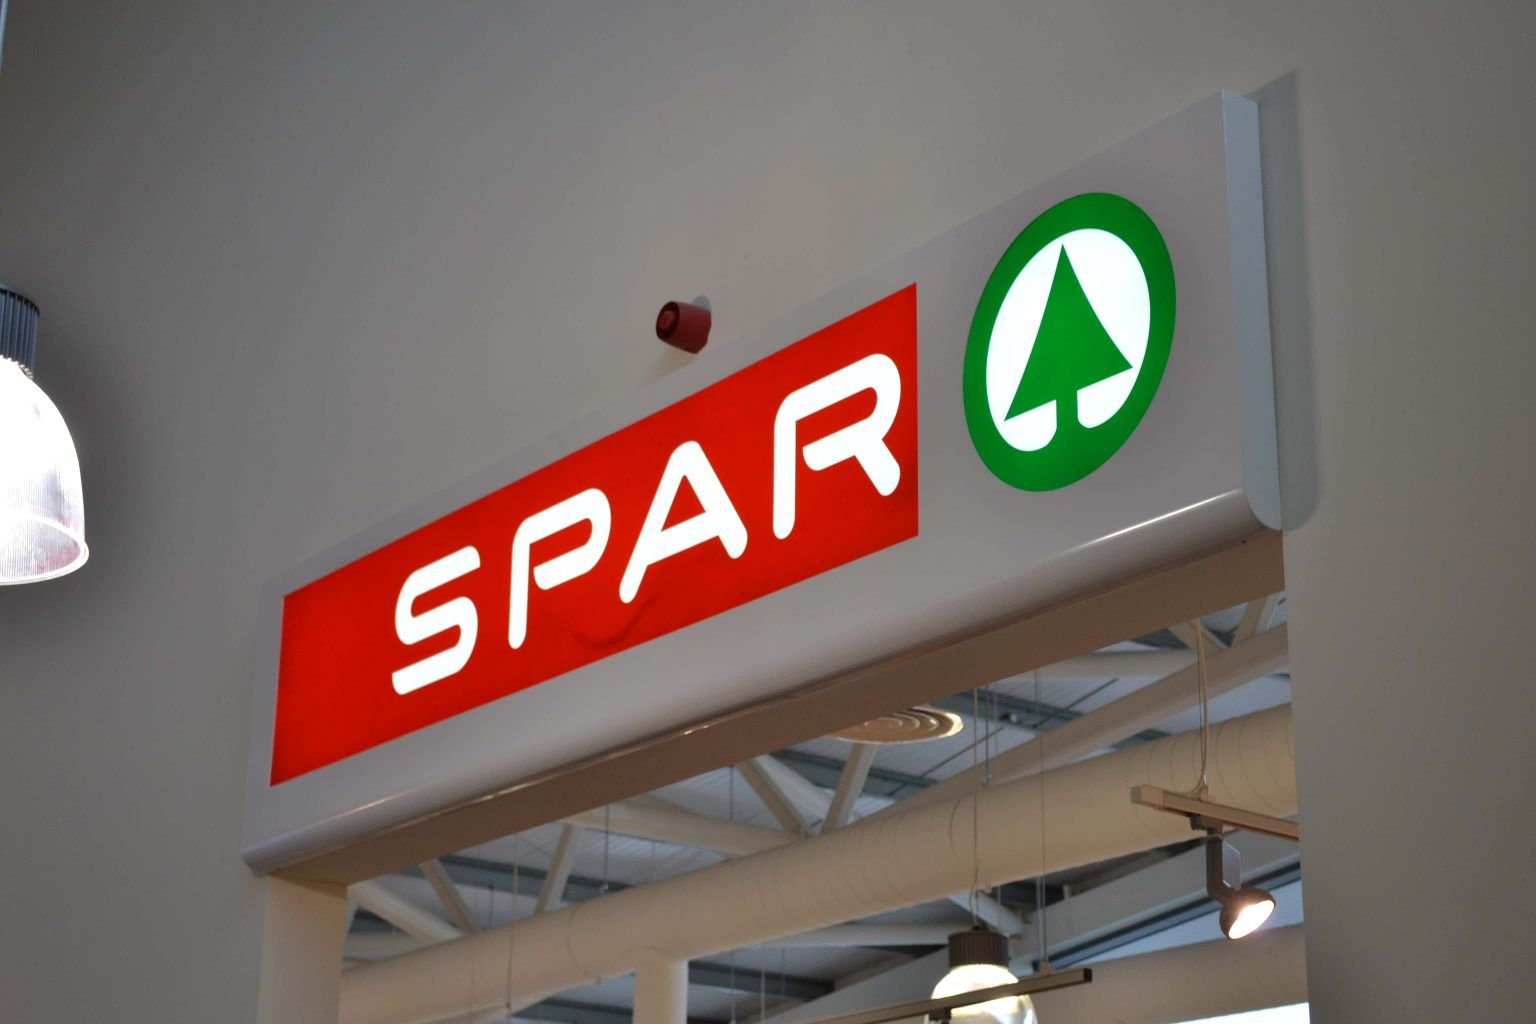 Spar Fascia Signs